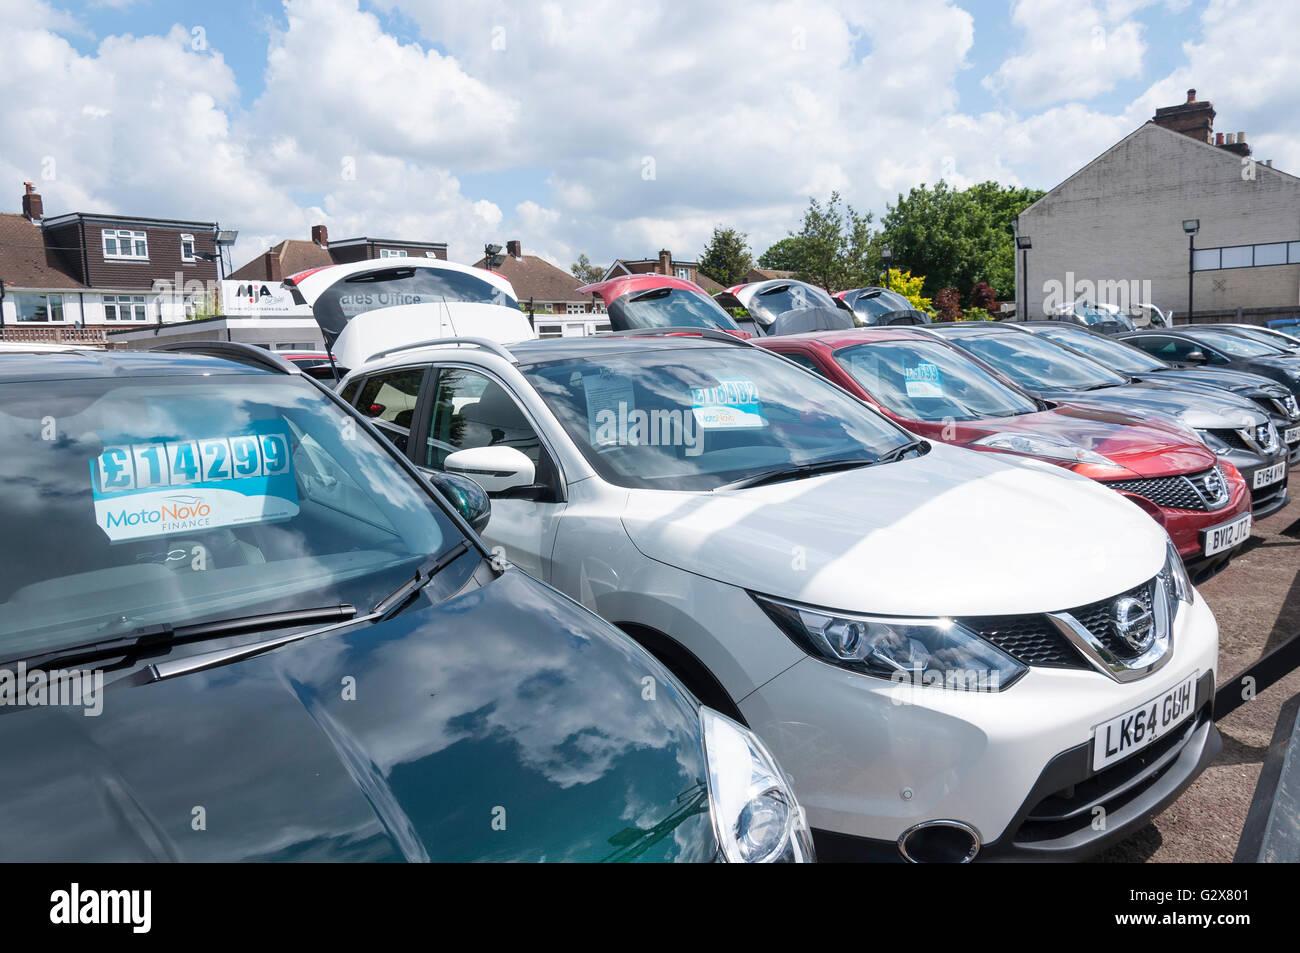 Used car sales yard in Staines Road West, Sunbury-on-Thames, Surrey, England, United Kingdom - Stock Image